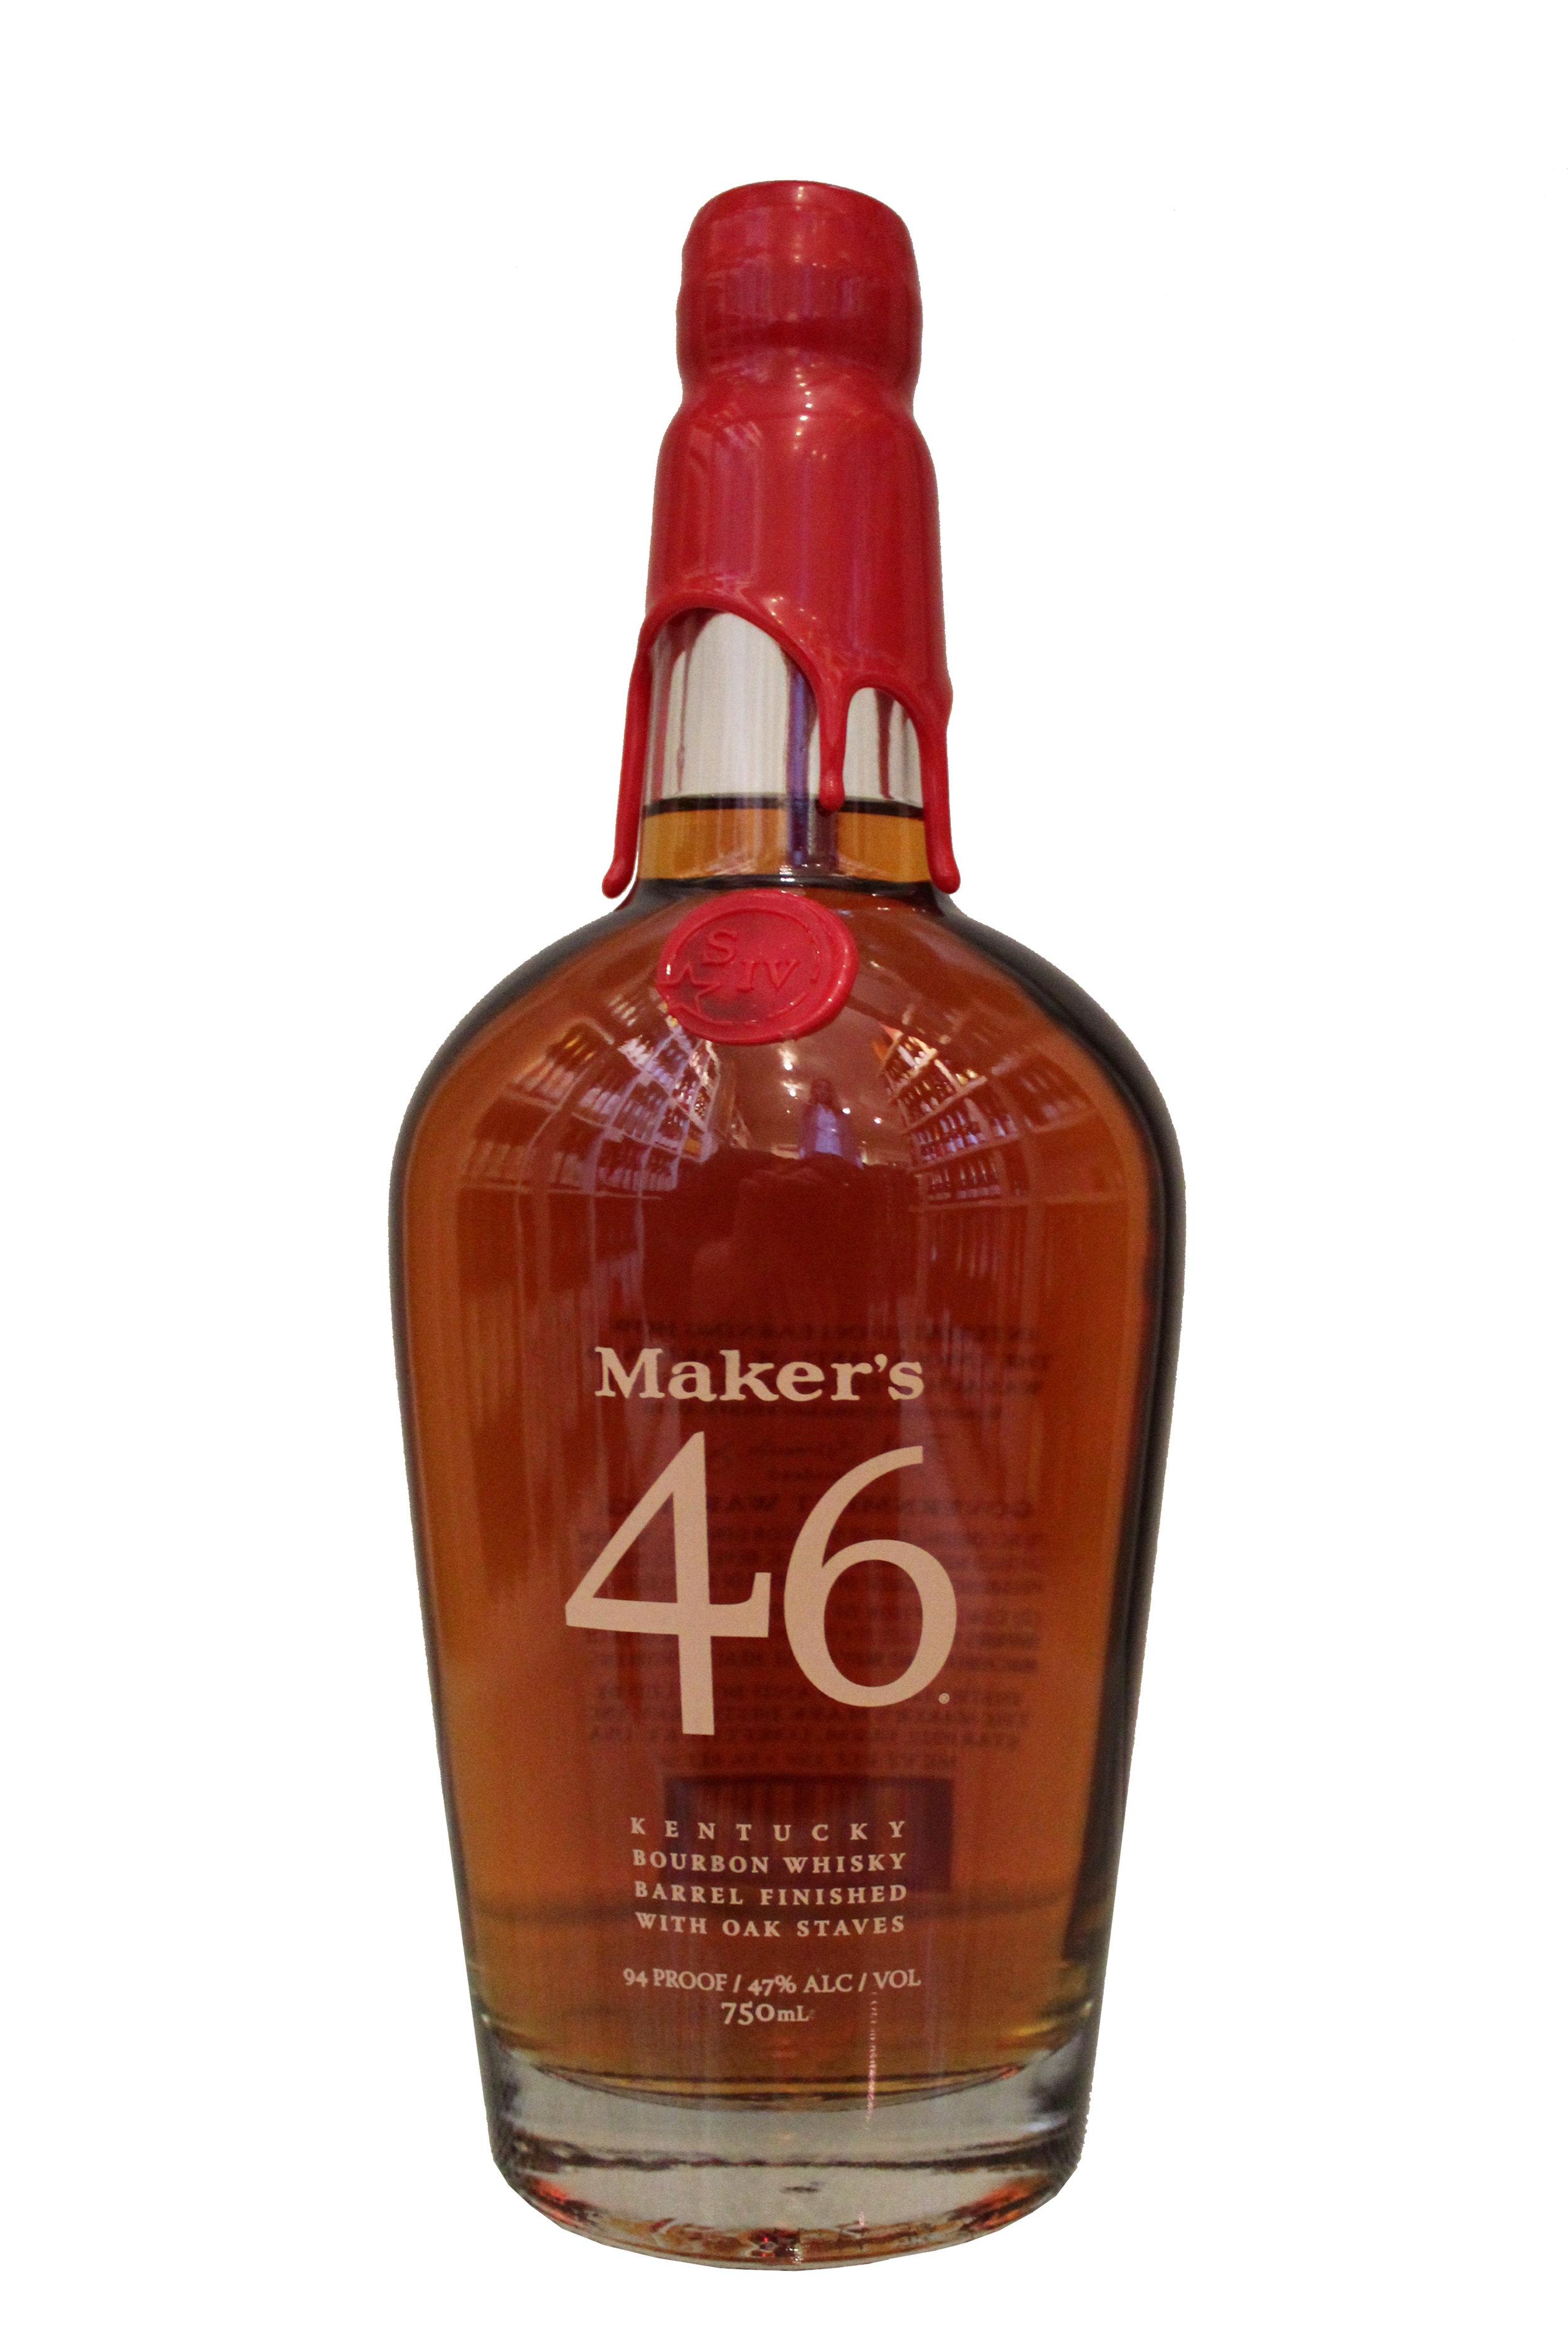 Barrel Finished Bourbon  Maker's 46, Kentucky